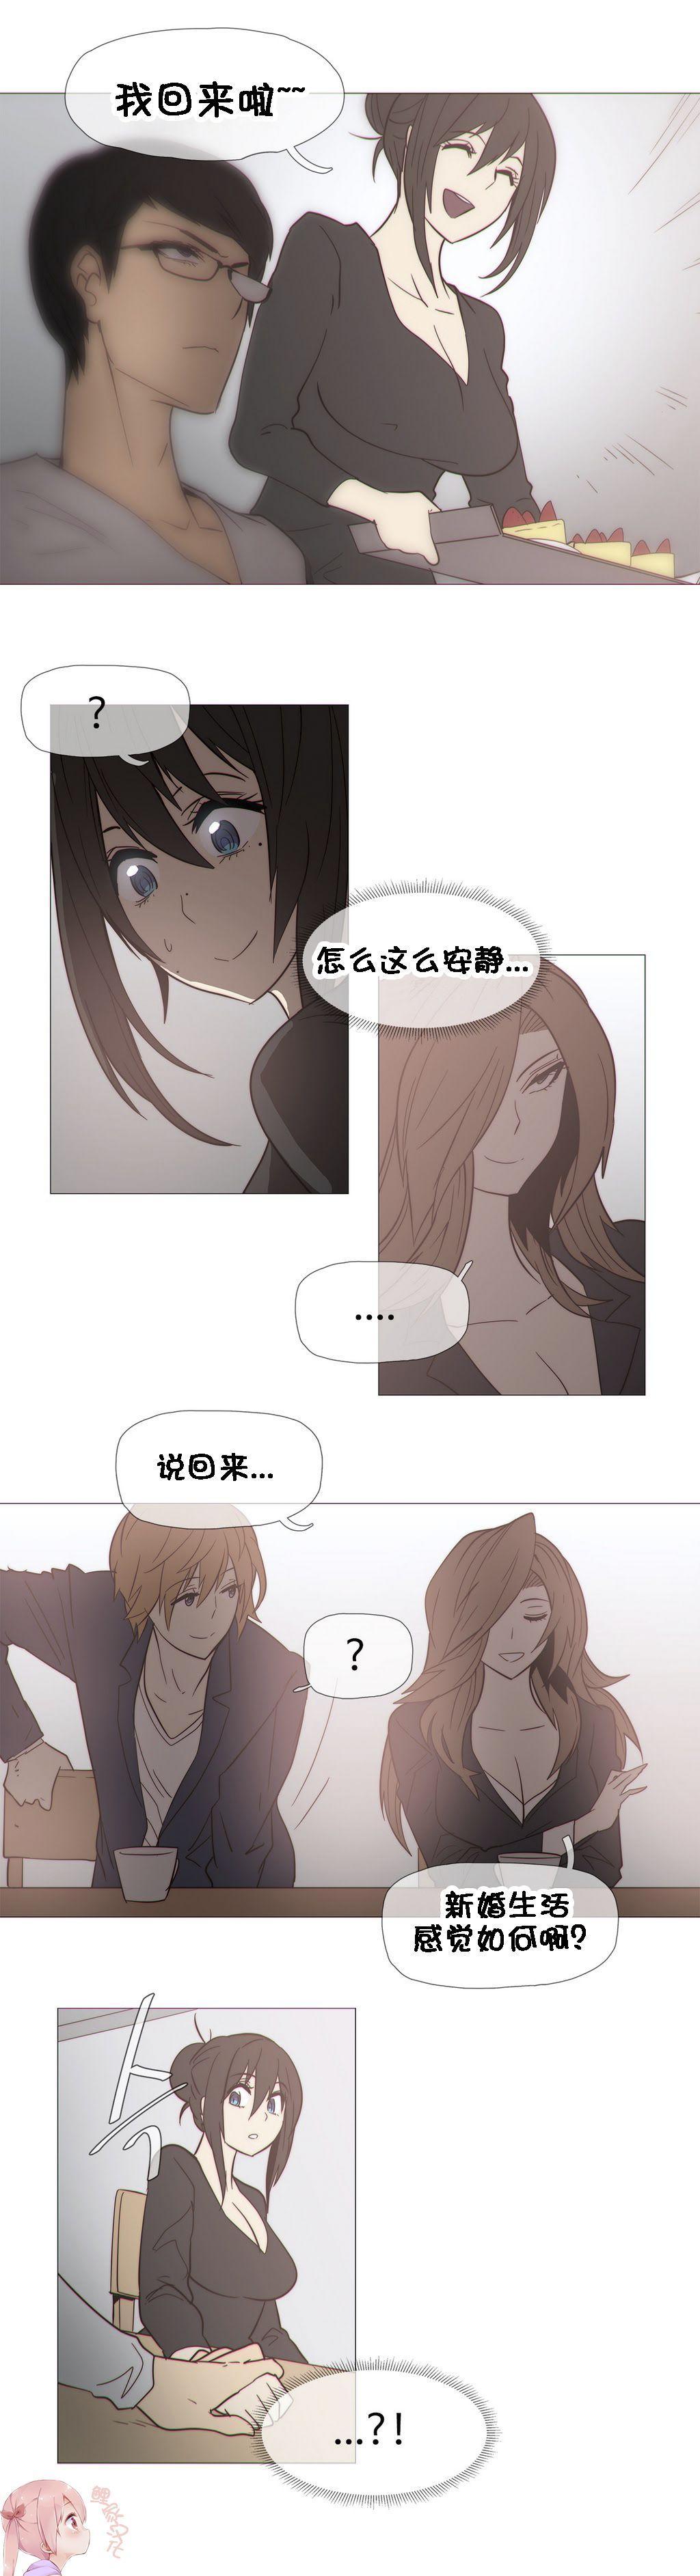 HouseHold Affairs 【卞赤鲤个人汉化】1~33话(持续更新中) 644